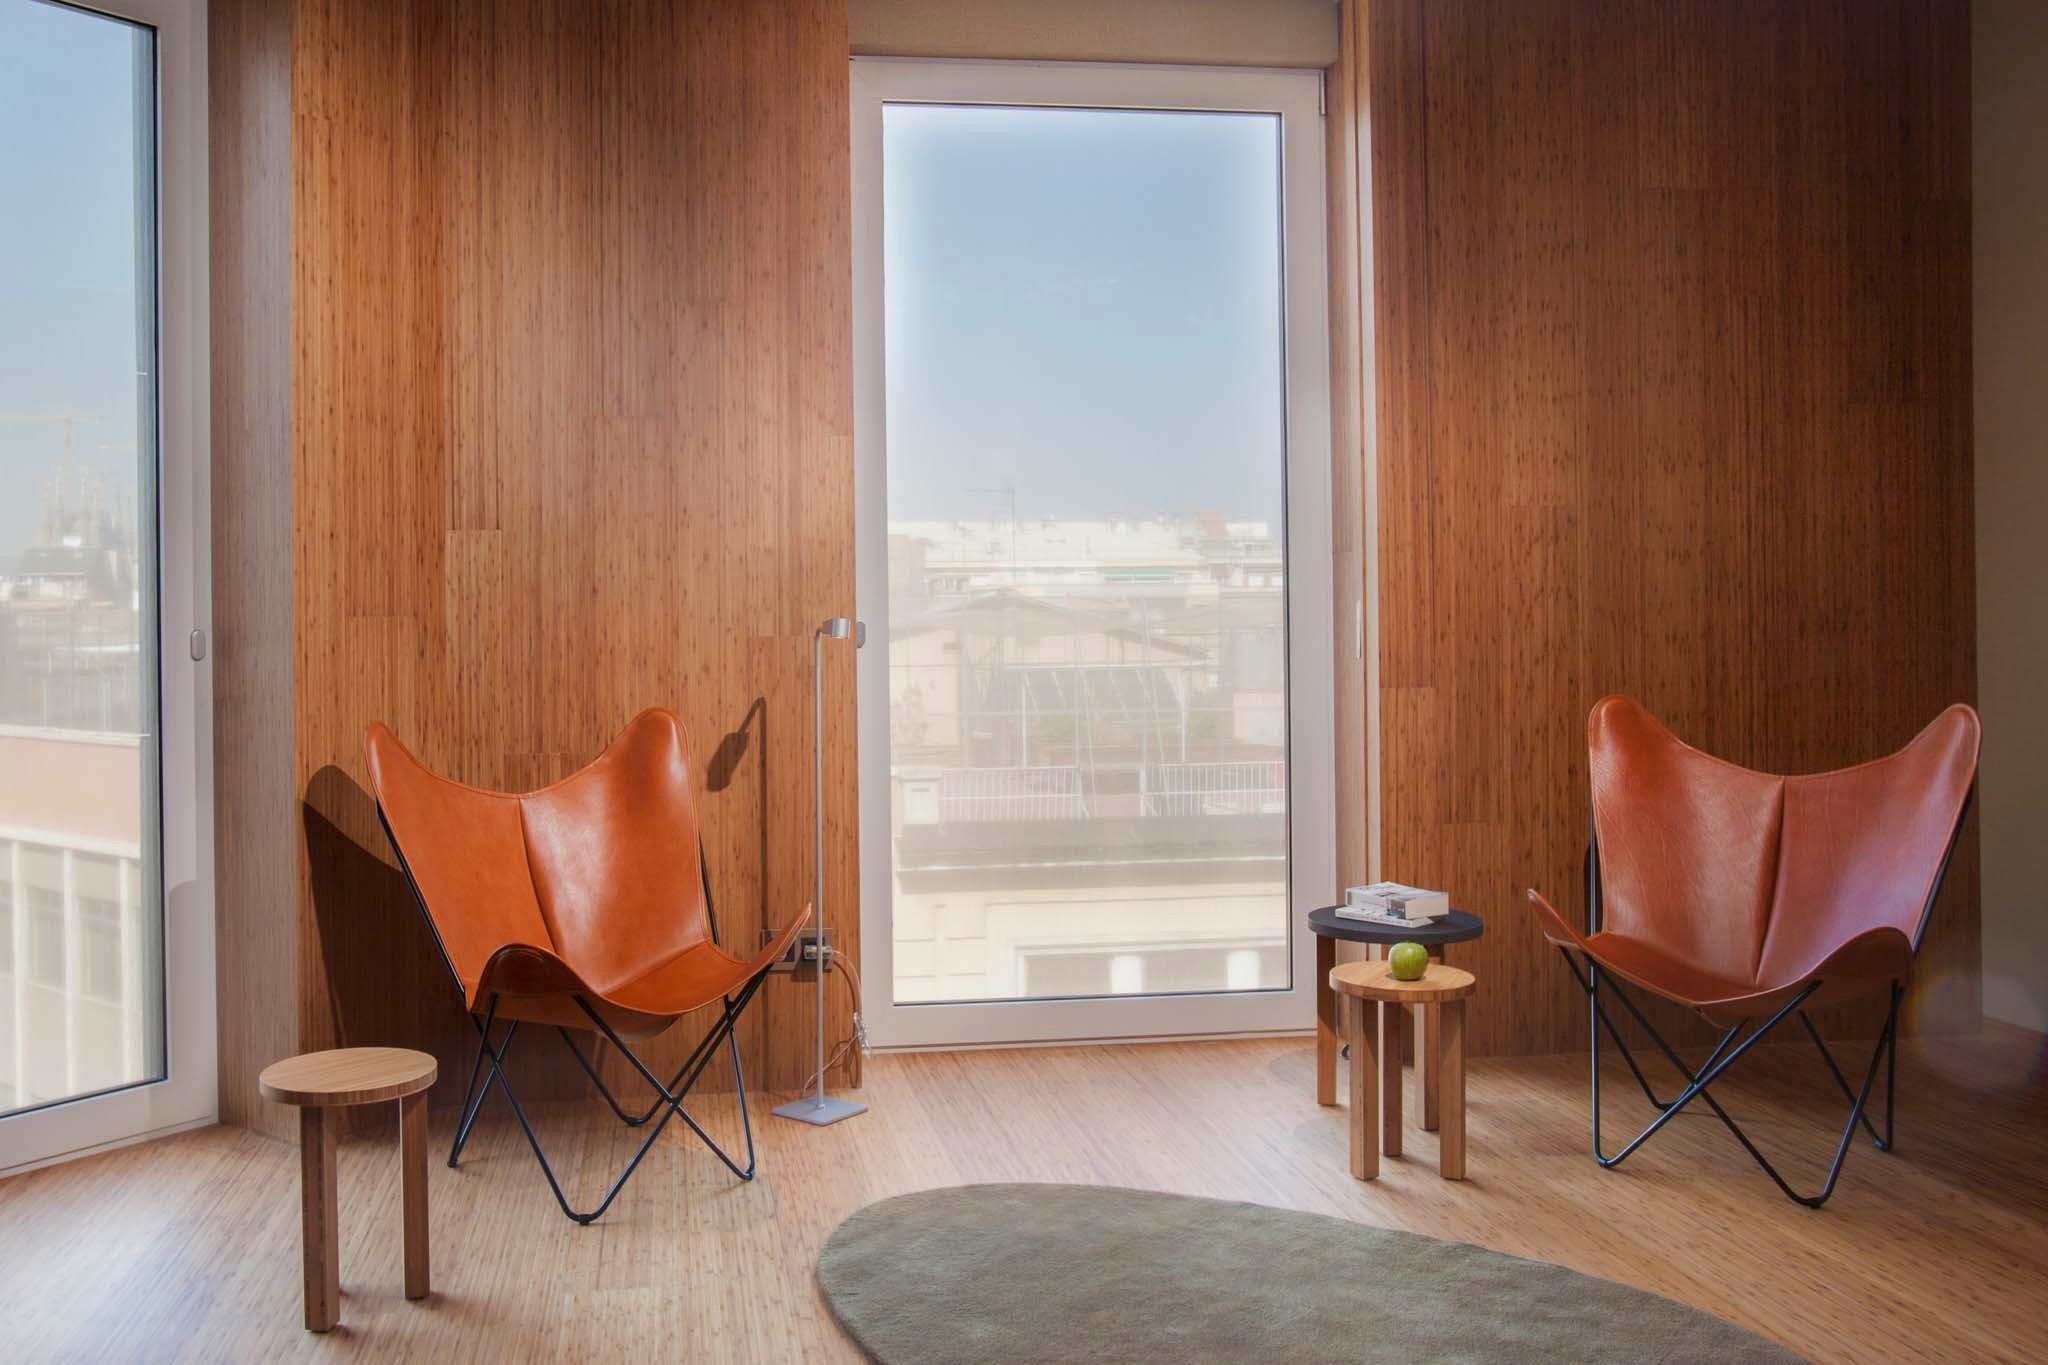 hardwood floor bedroom of surprising wood floor furniture protectors with chaise lounge chair intended for surprising wood floor furniture protectors with chaise lounge chair cover new luxur